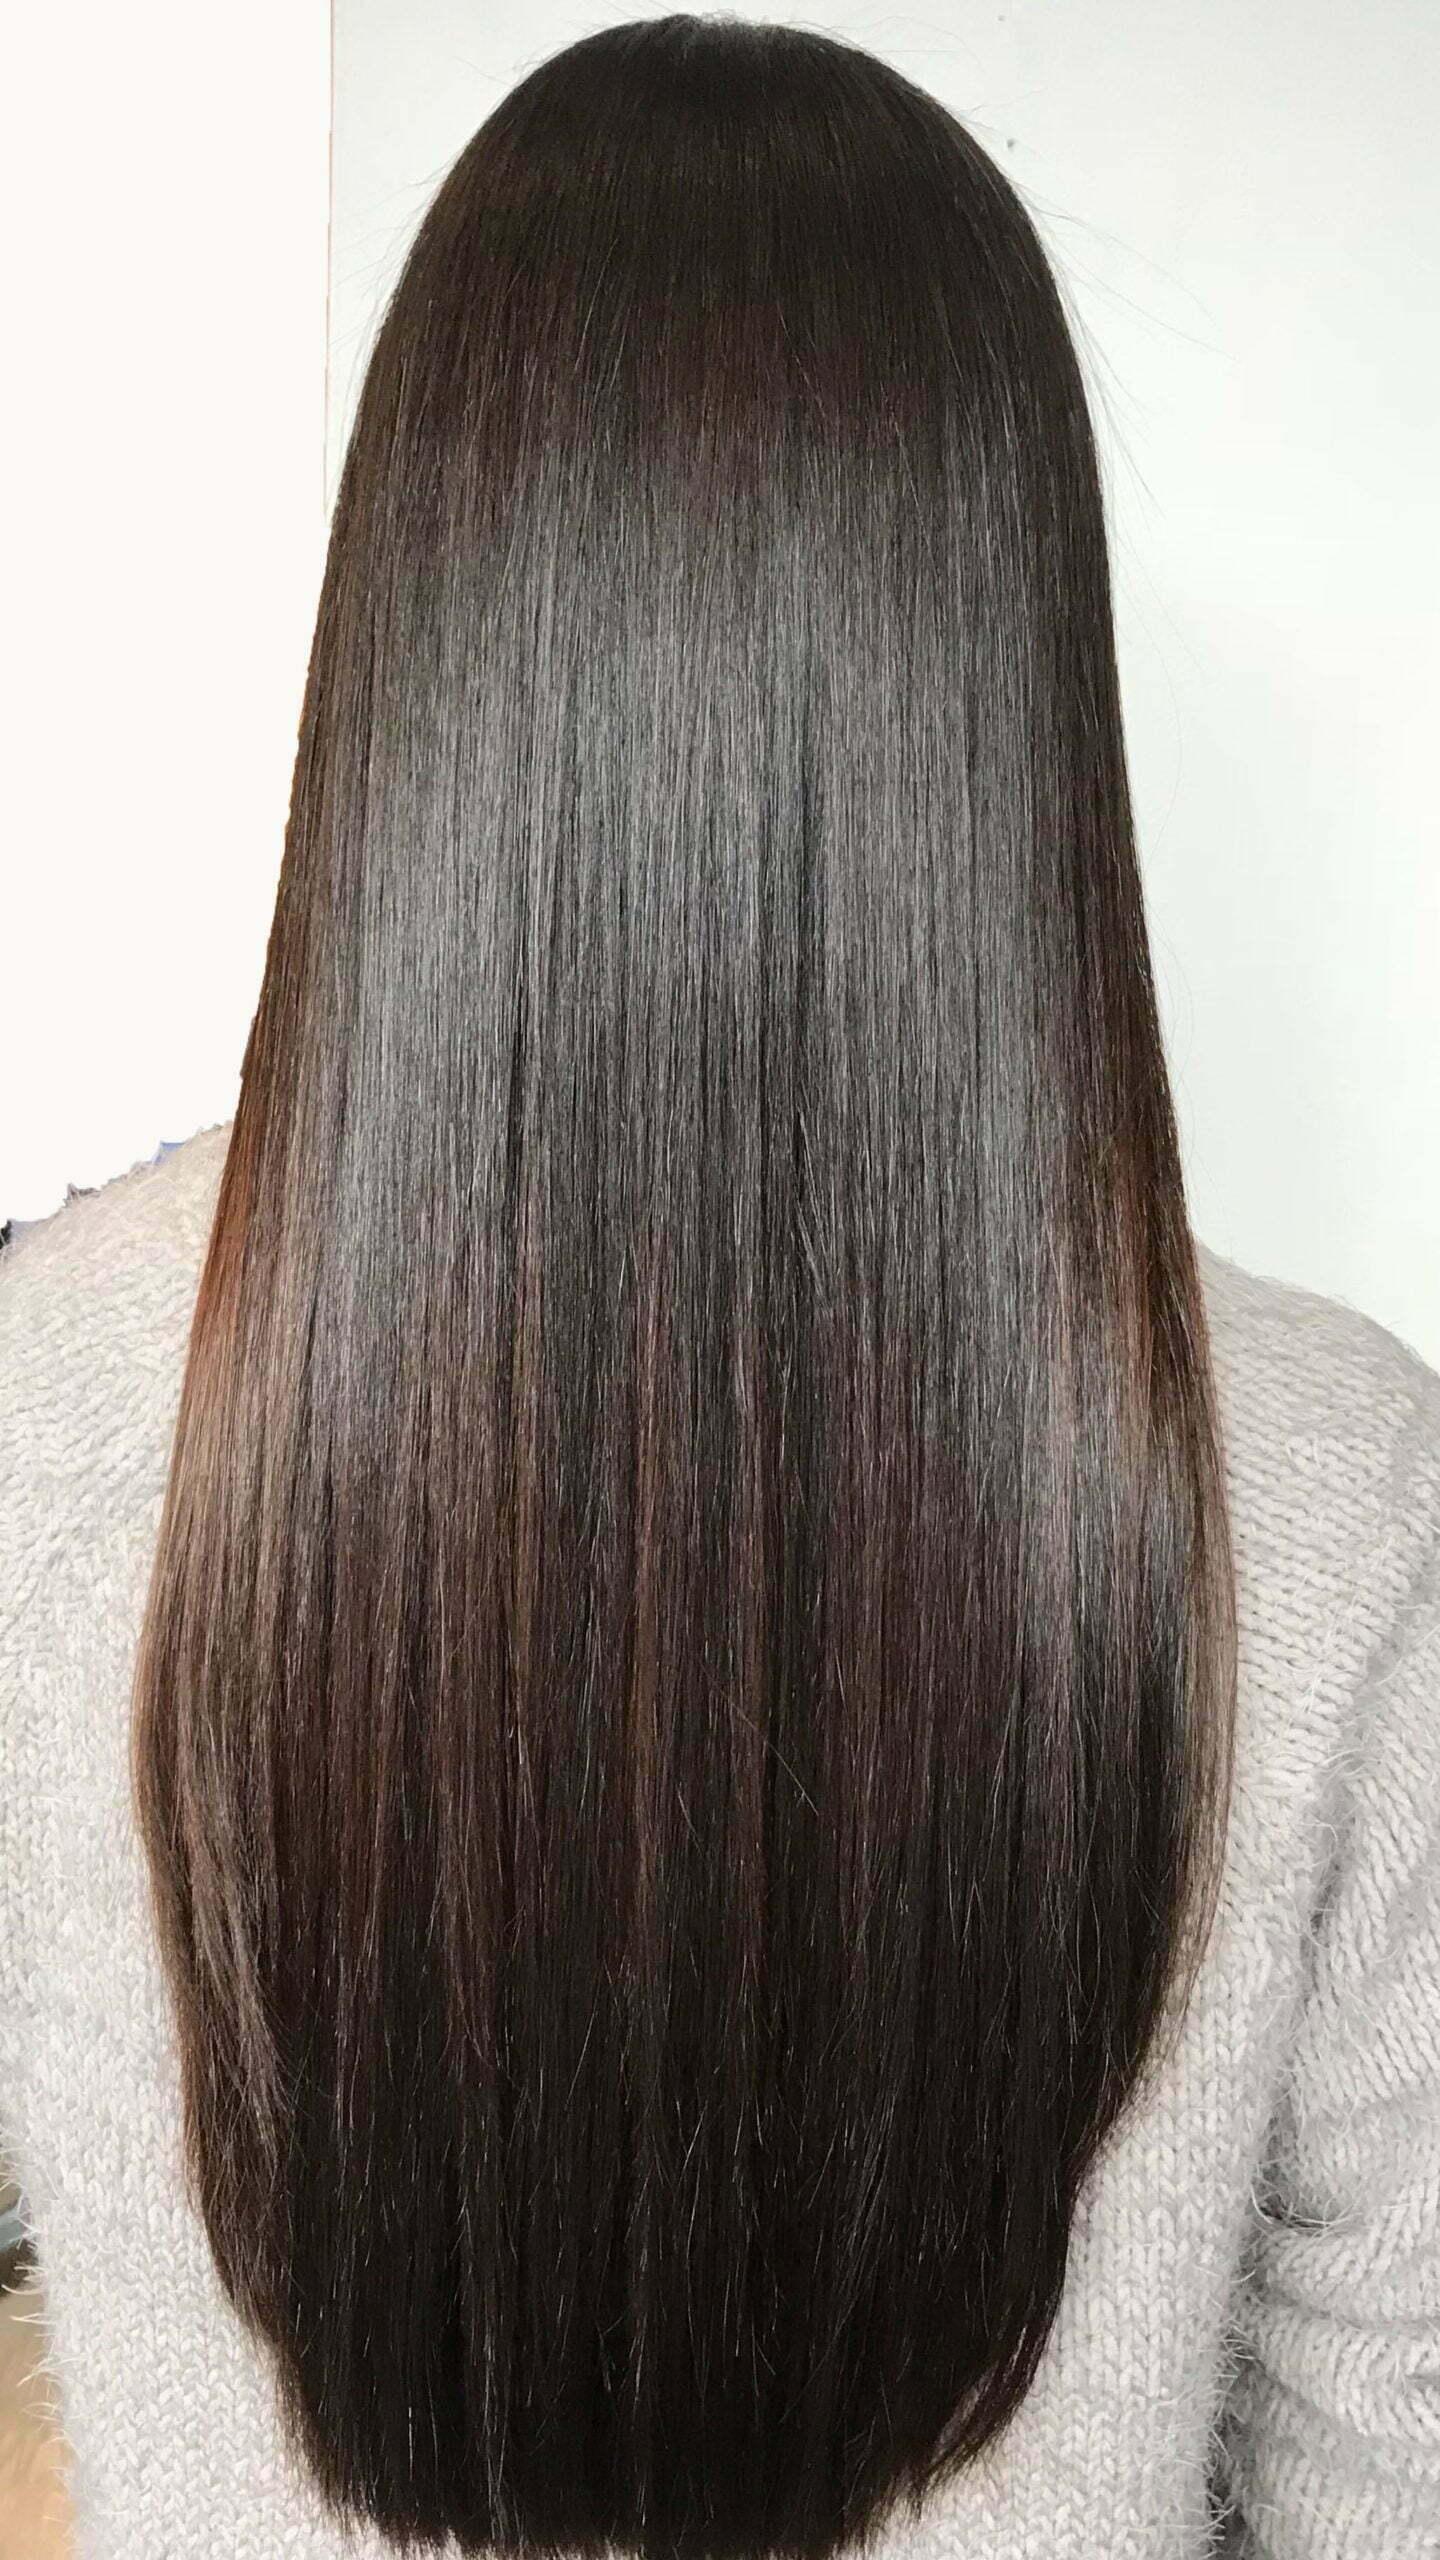 permanent hair straightening treatments Denver, CO